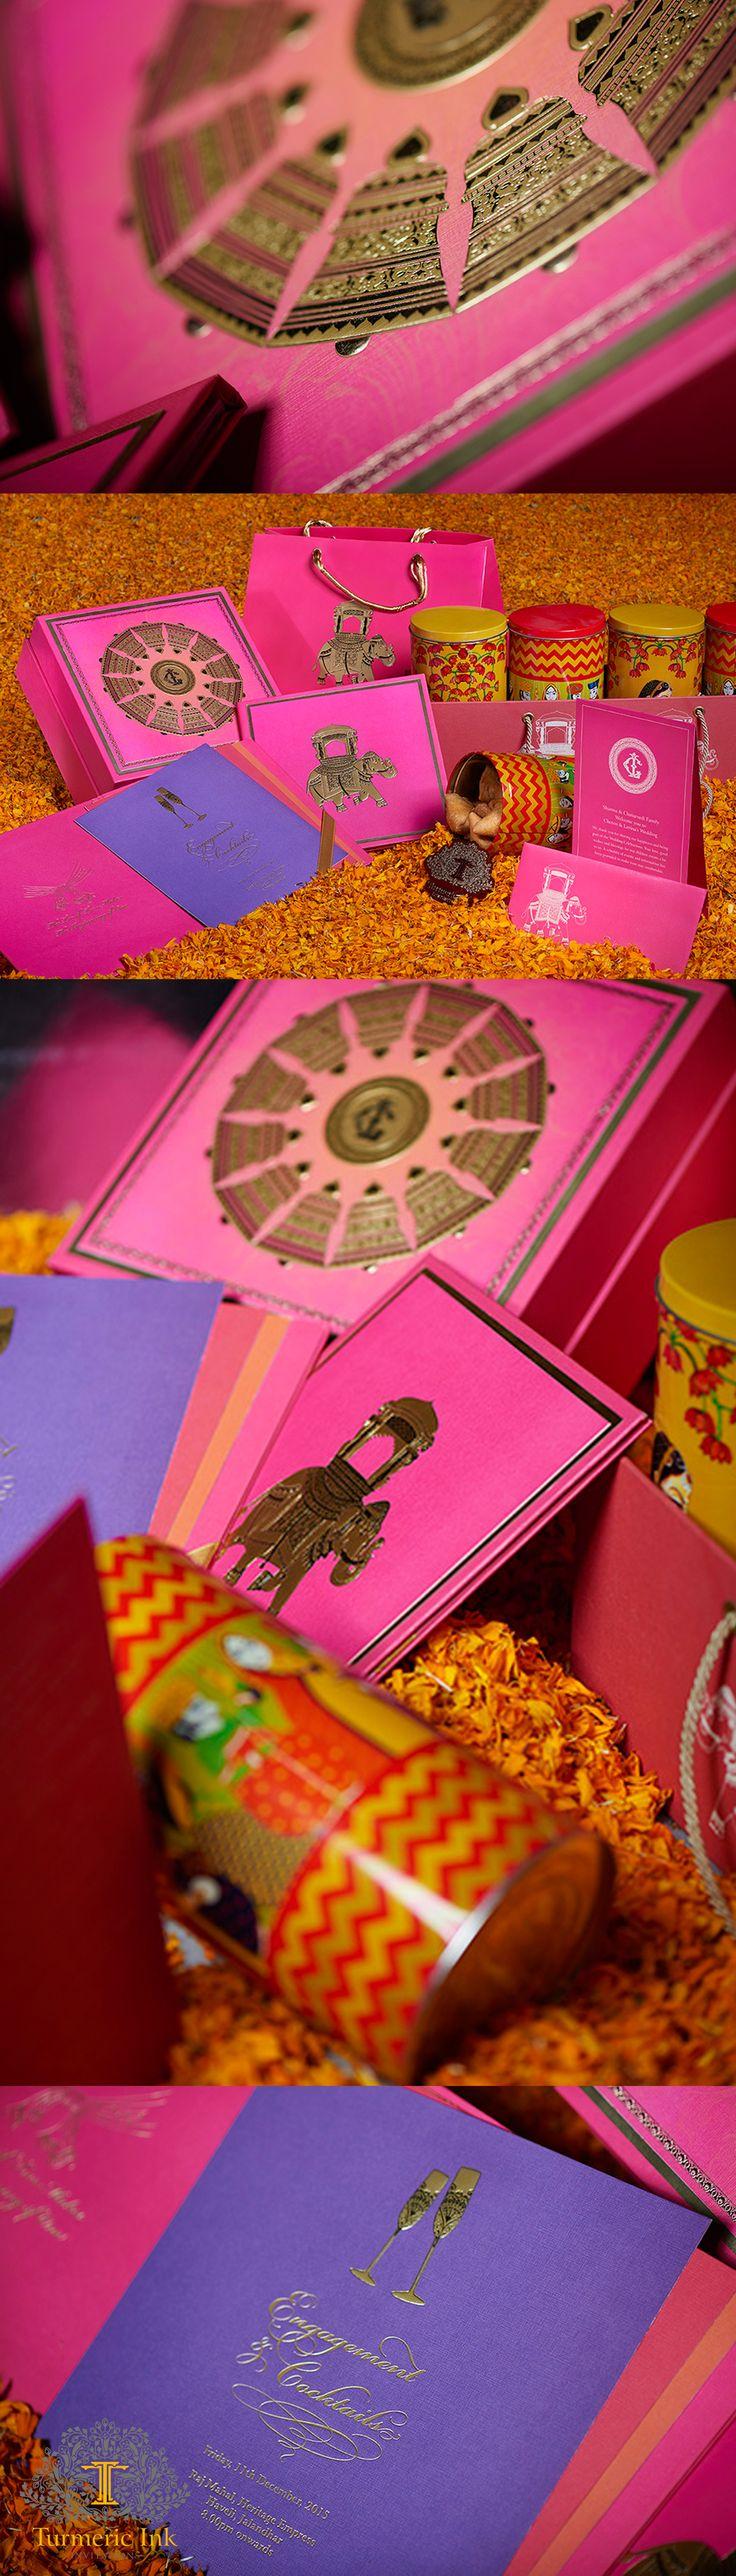 keralwedding card wordings in english%0A invite  invitations  Indian wedding invite  wedding card  bride  indian  bride